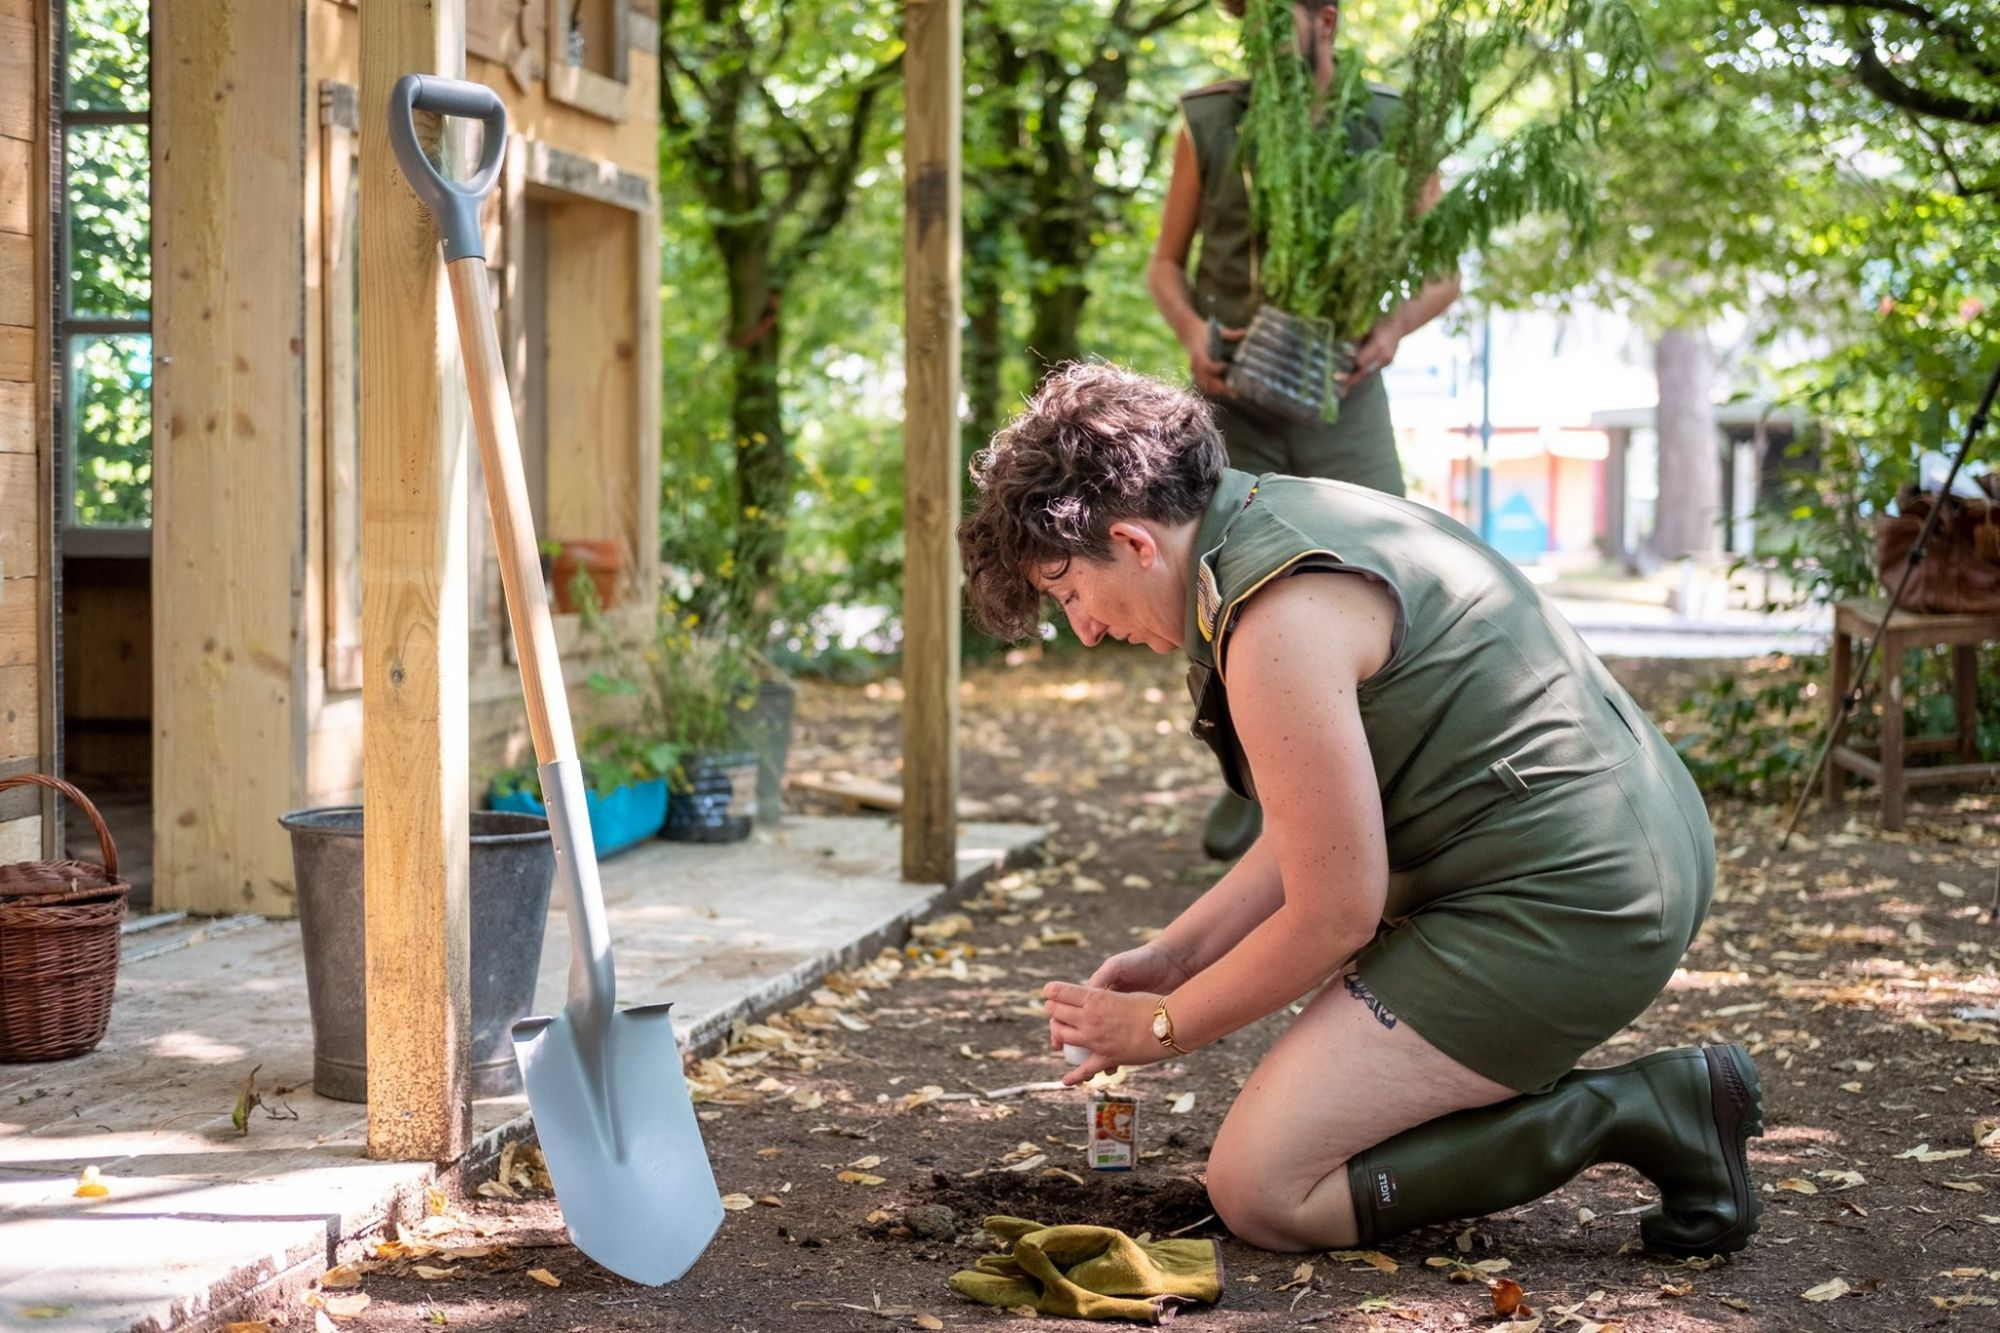 Le Grand T - L'Envol - Les jardiniers - Caroline Melon et Jonathan Macias